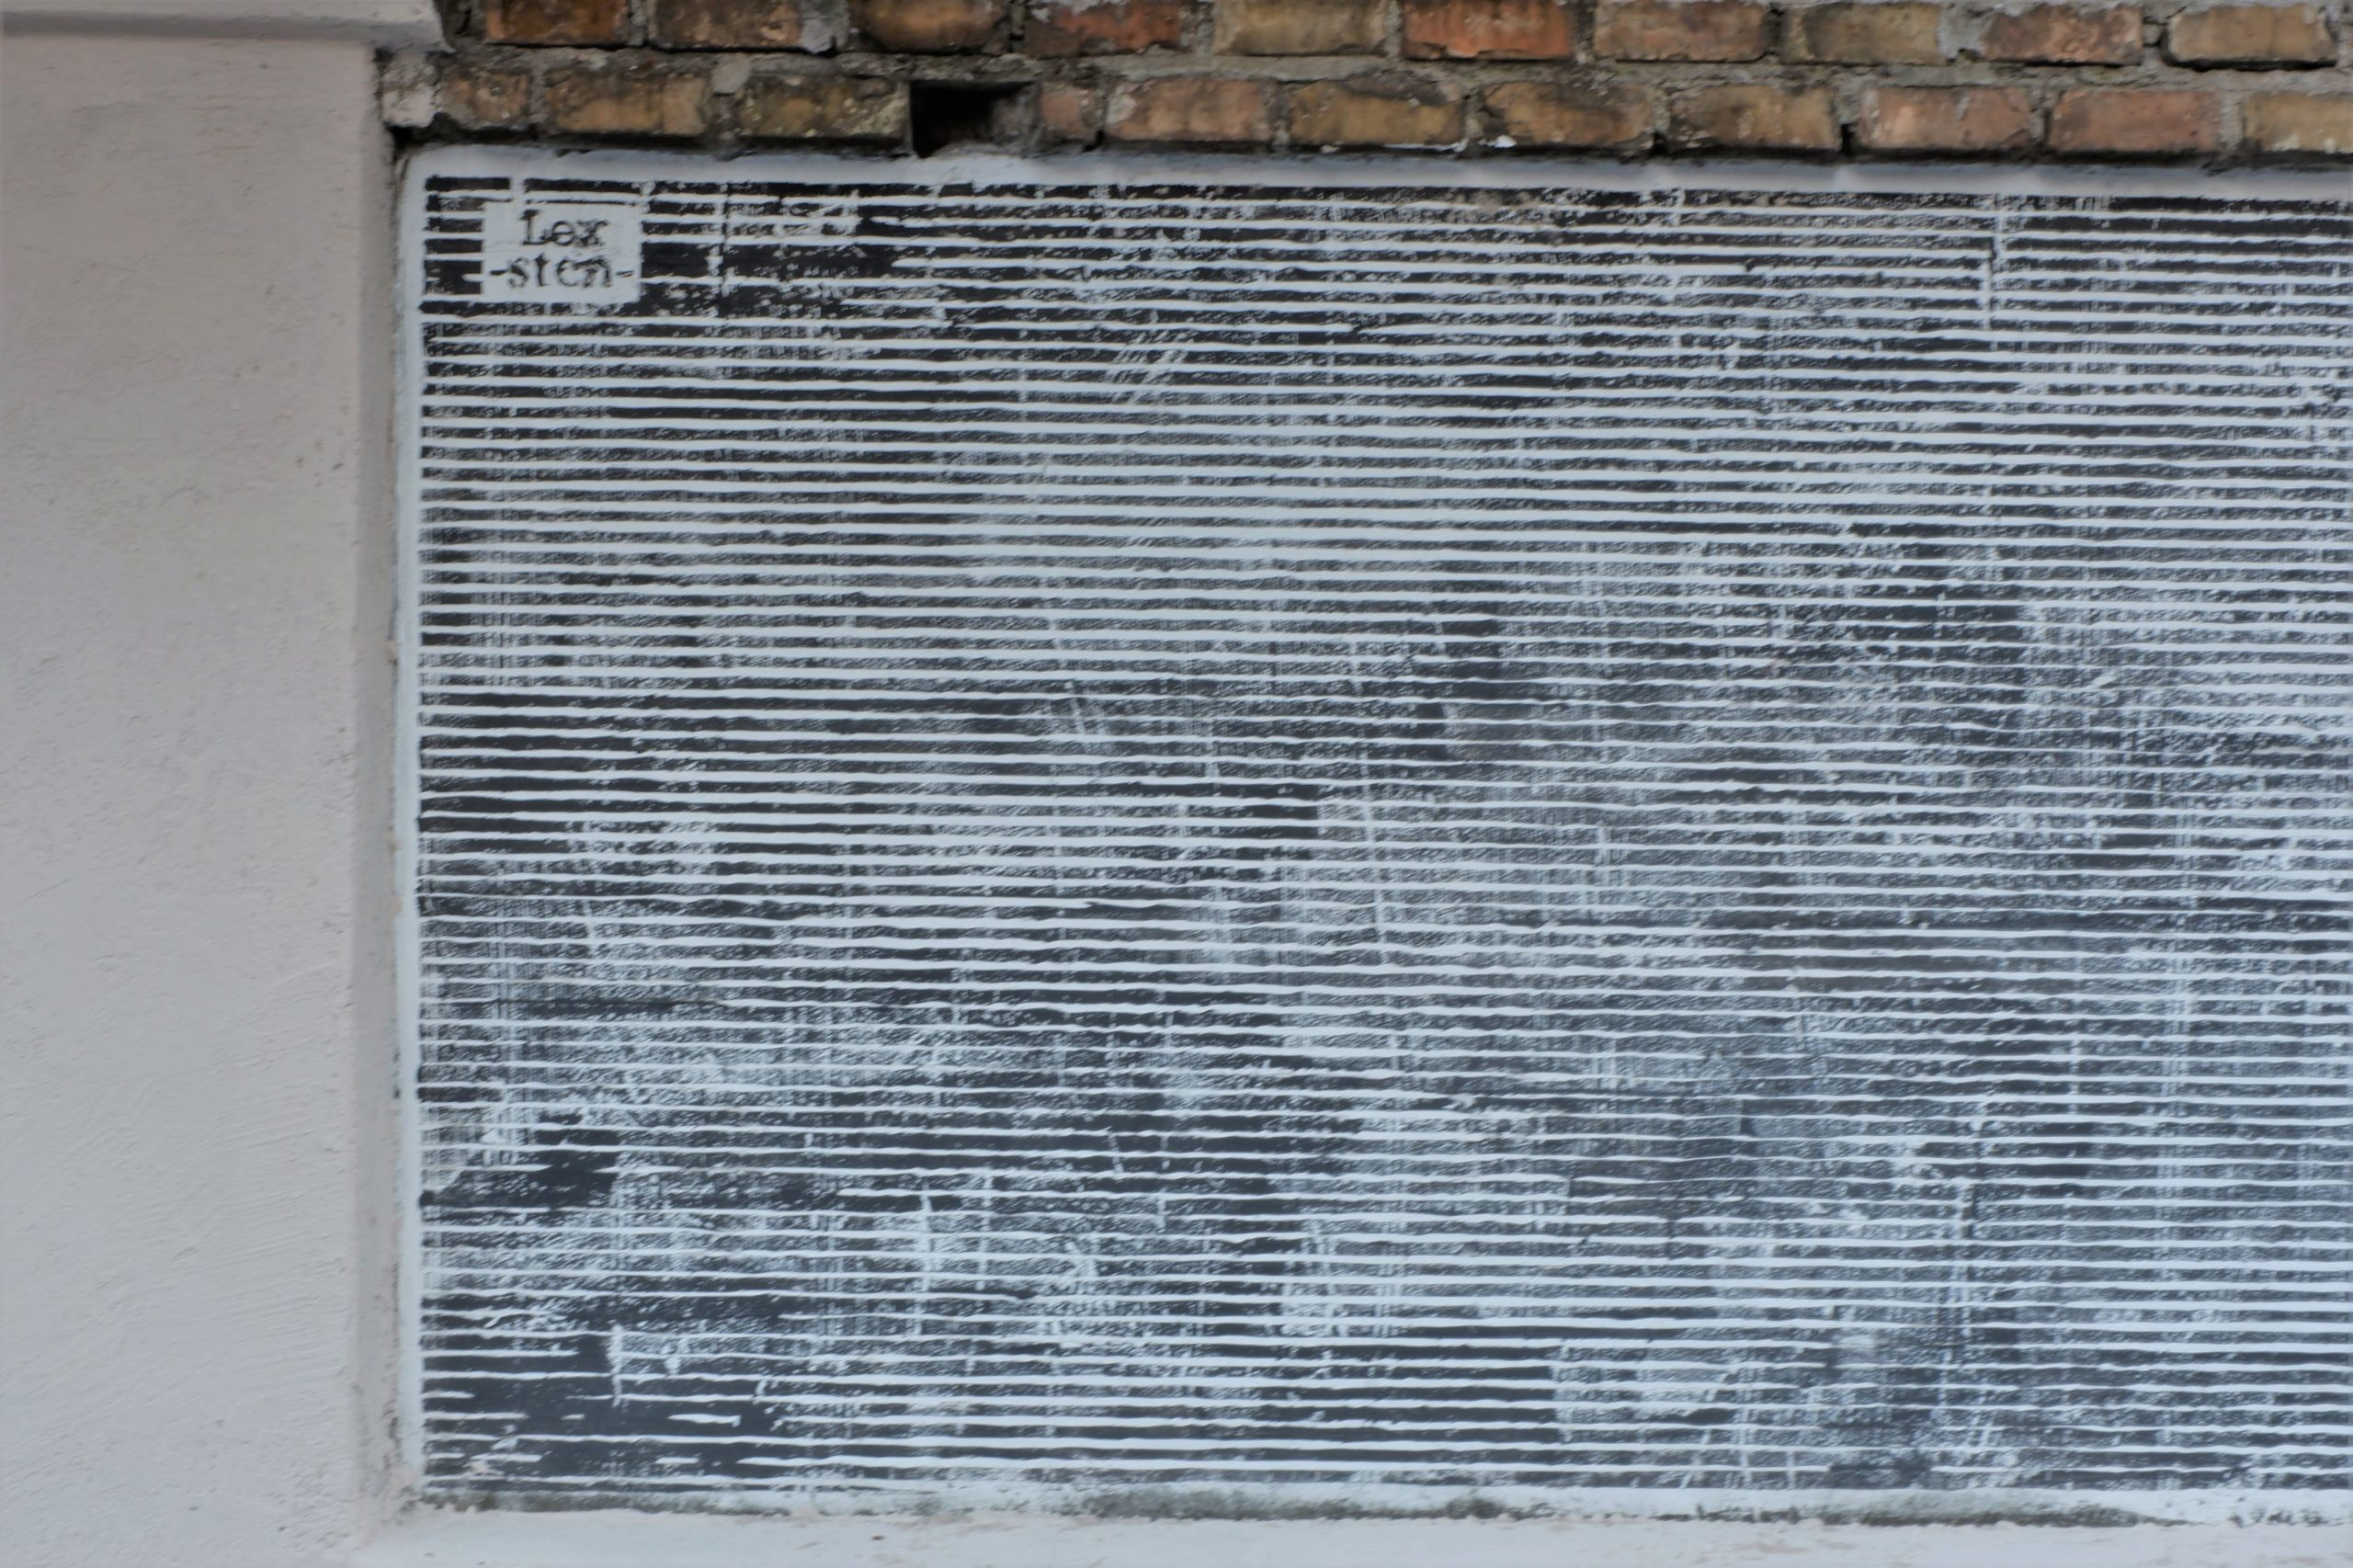 sten lex tor pignattara roma street art